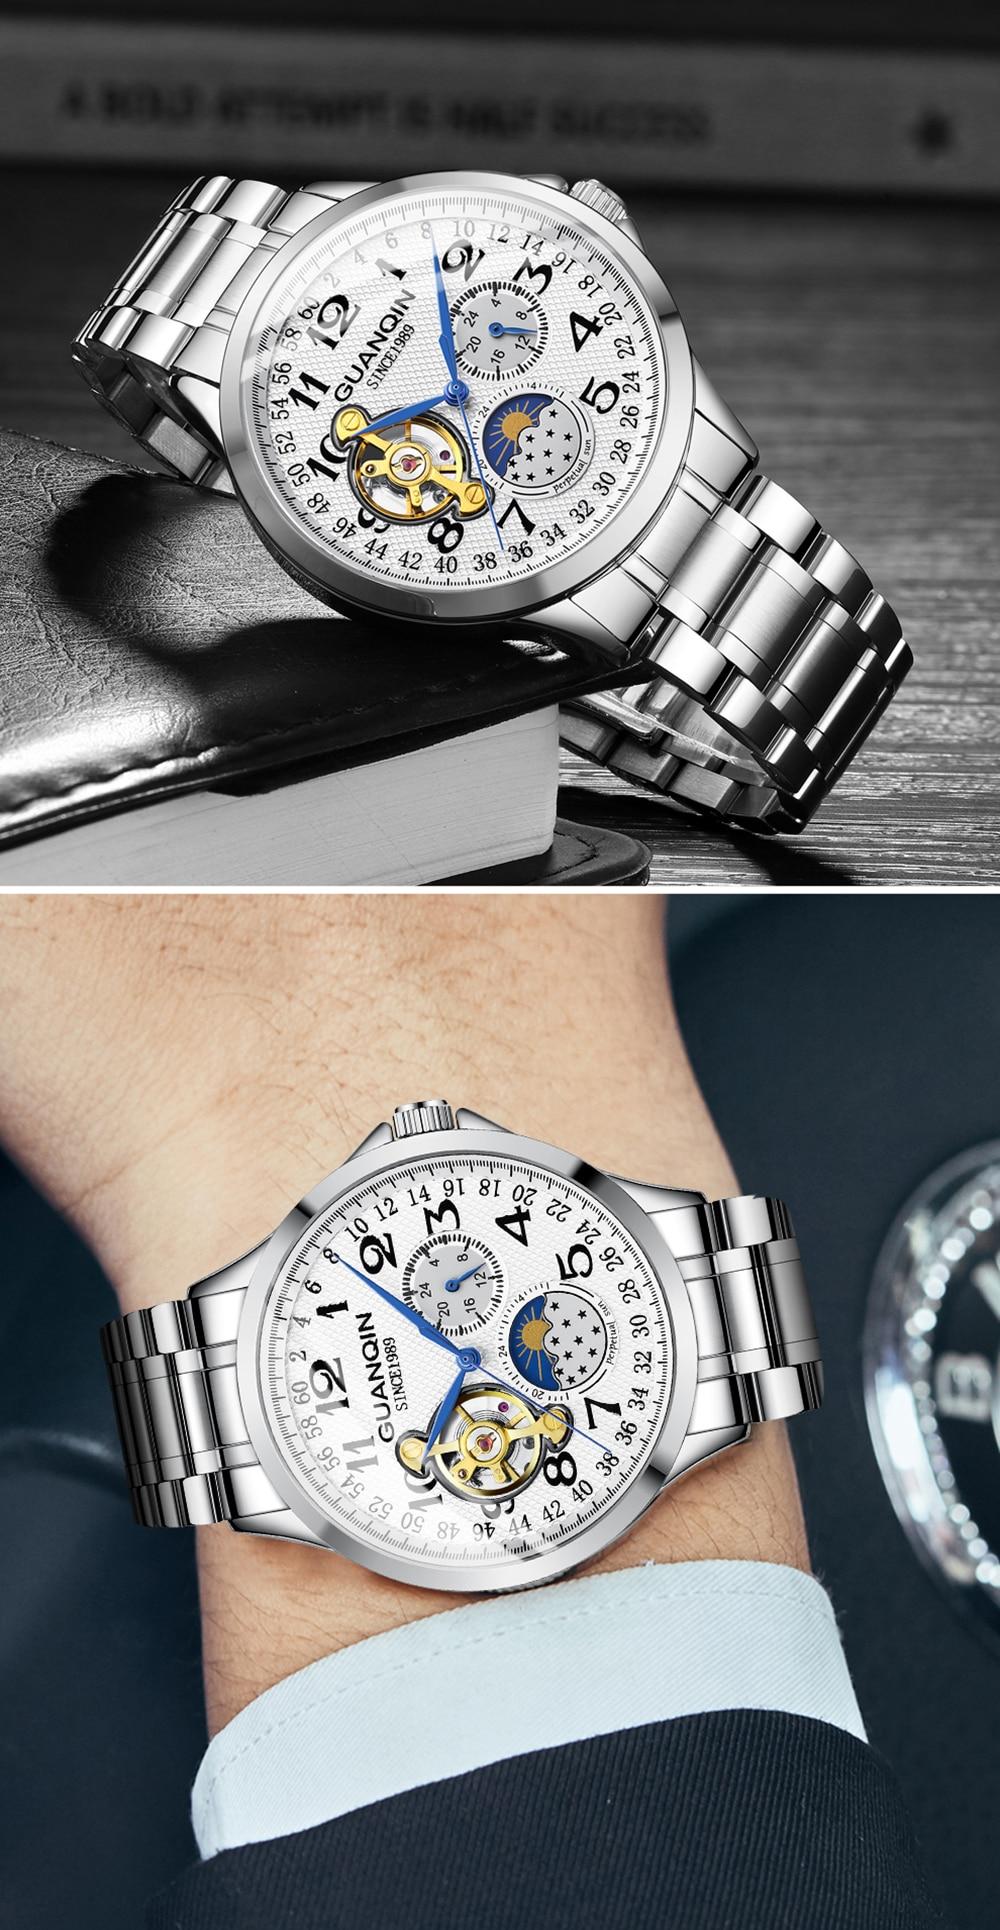 HTB1BlatamSD3KVjSZFKq6z10VXaE 2019 Fashion GUANQIN Mens Watches Top Brand Luxury Skeleton Watch Men Sport Leather Tourbillon Automatic Mechanical Wristwatch